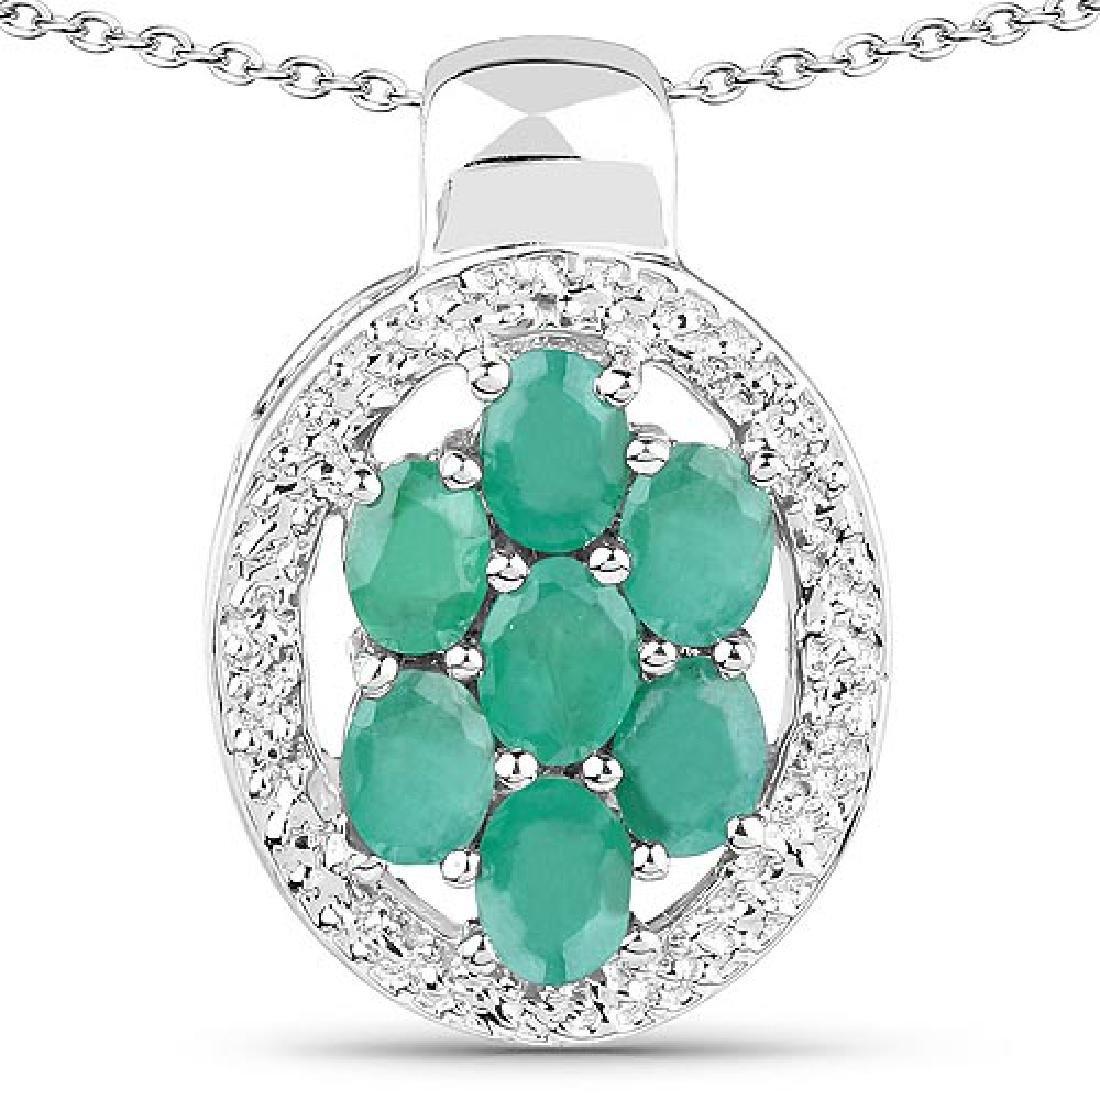 0.98 Carat Genuine Emerald .925 Sterling Silver Pendant